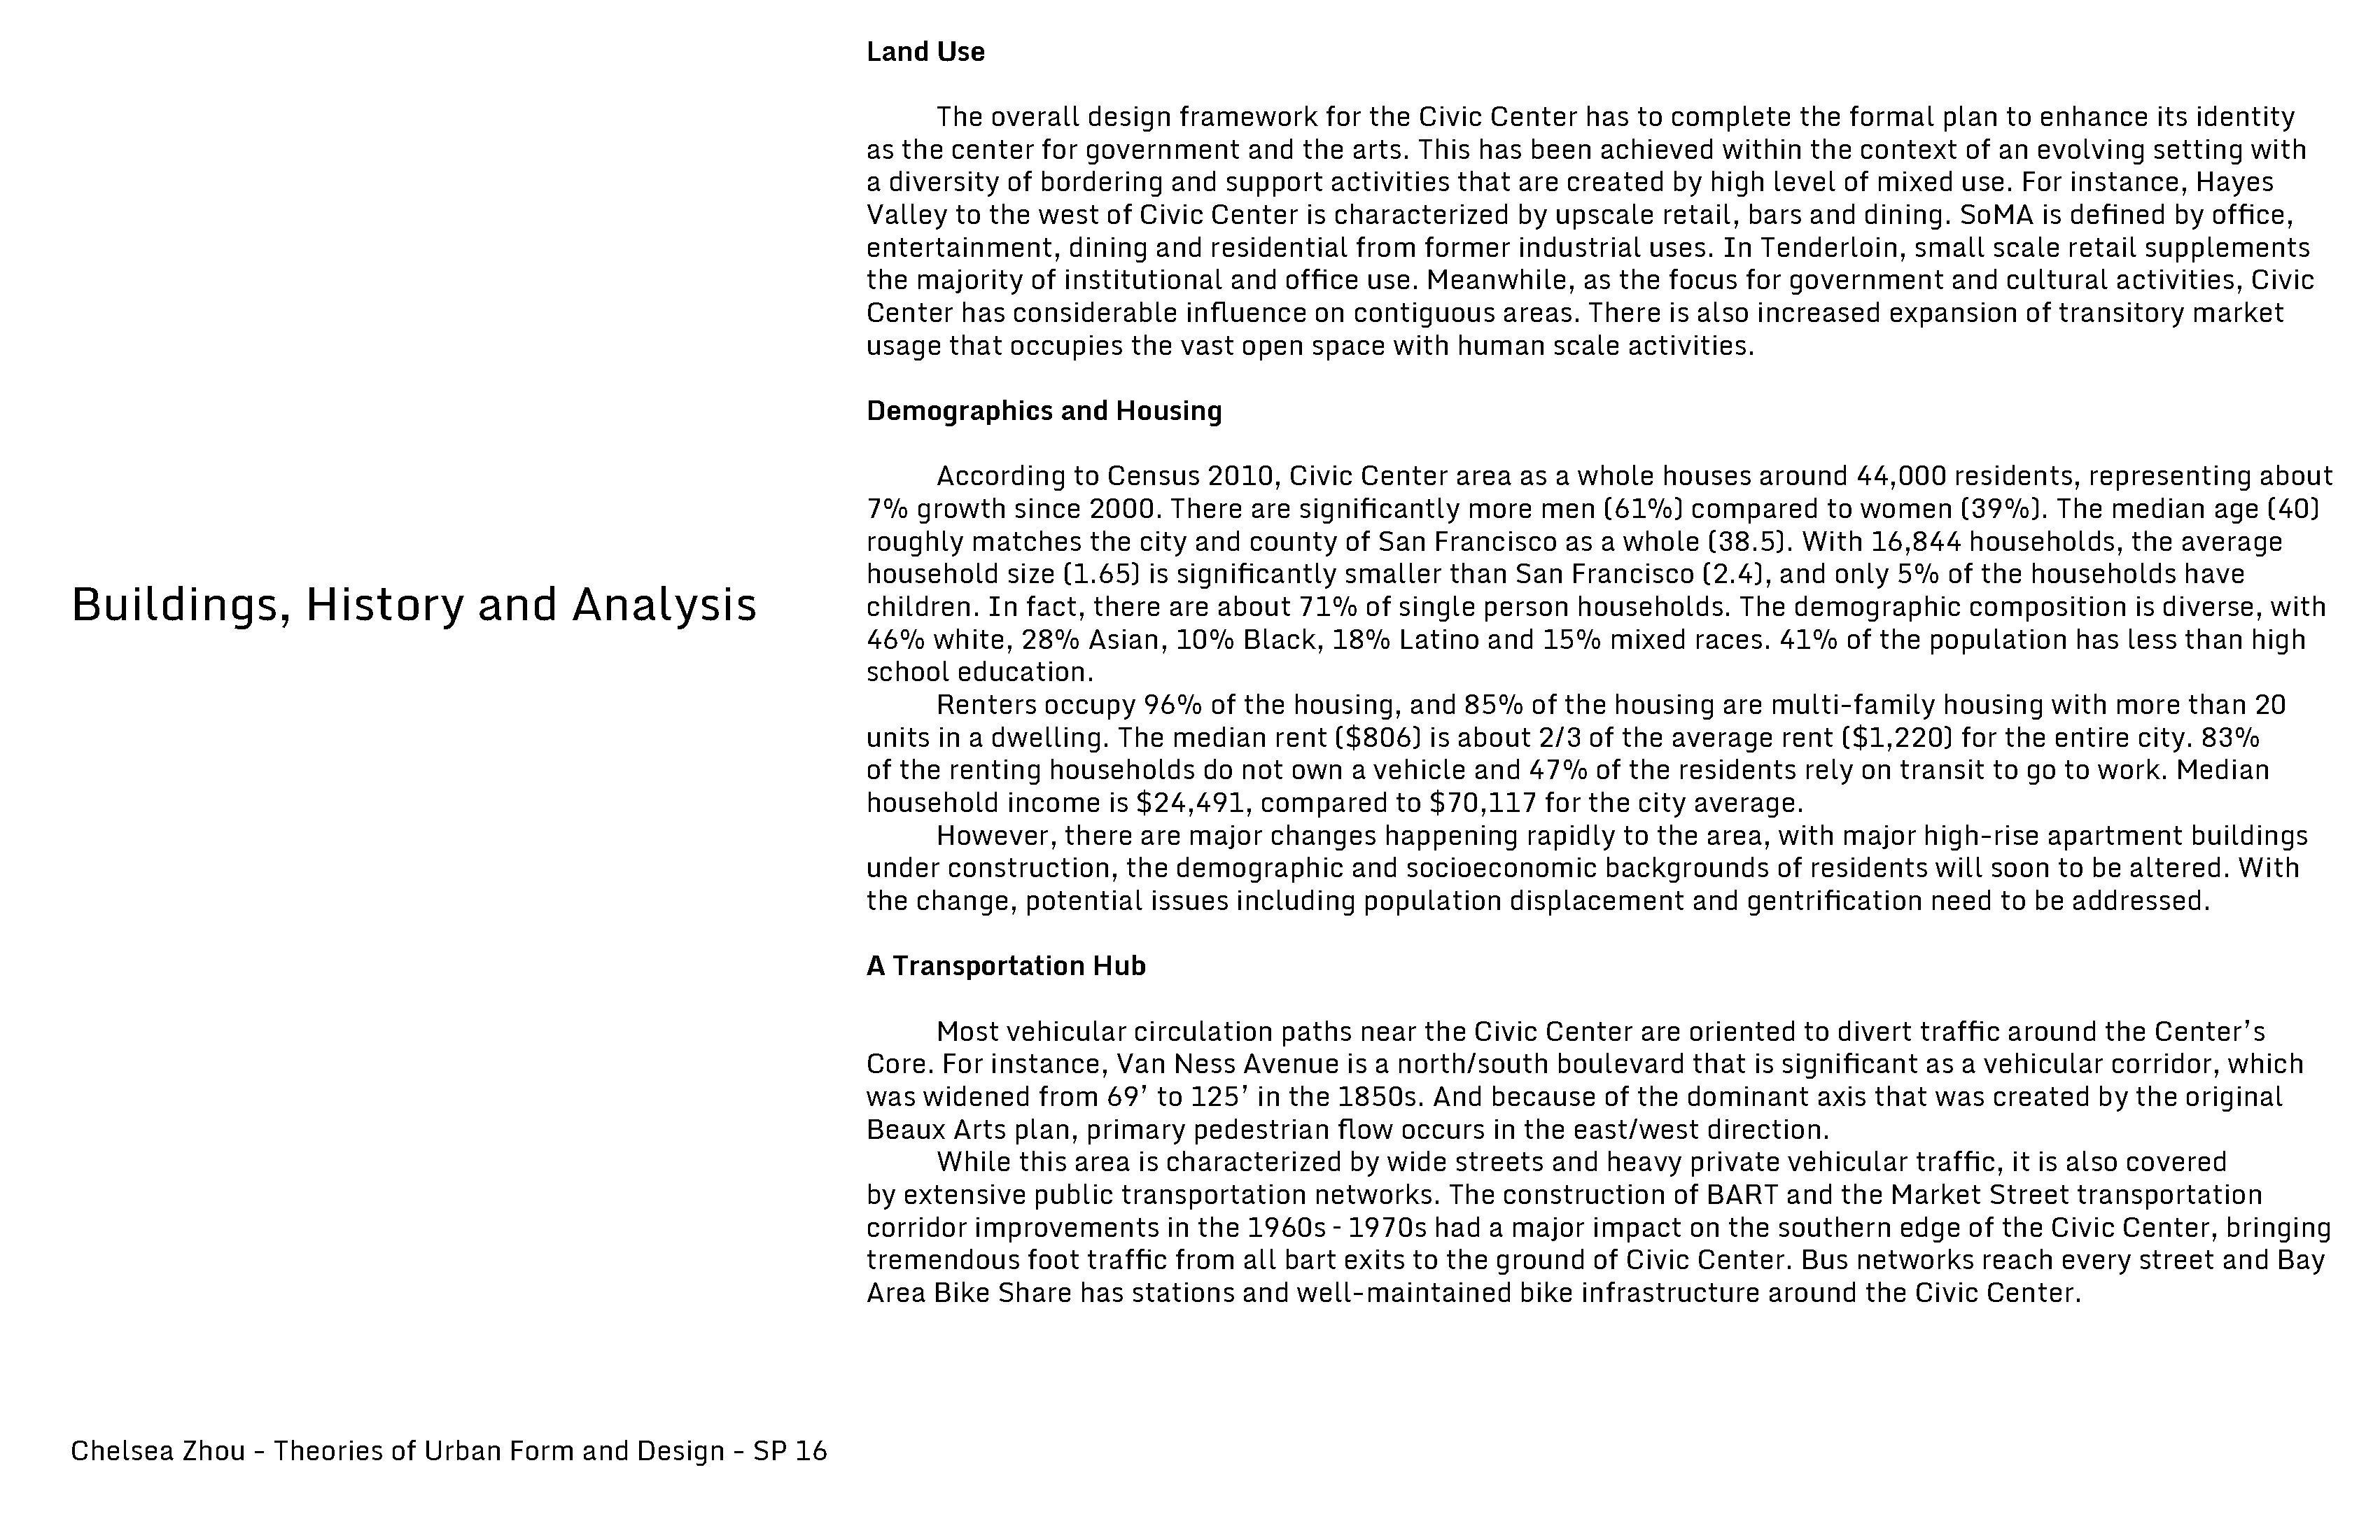 morph analysis cz final_Page_15